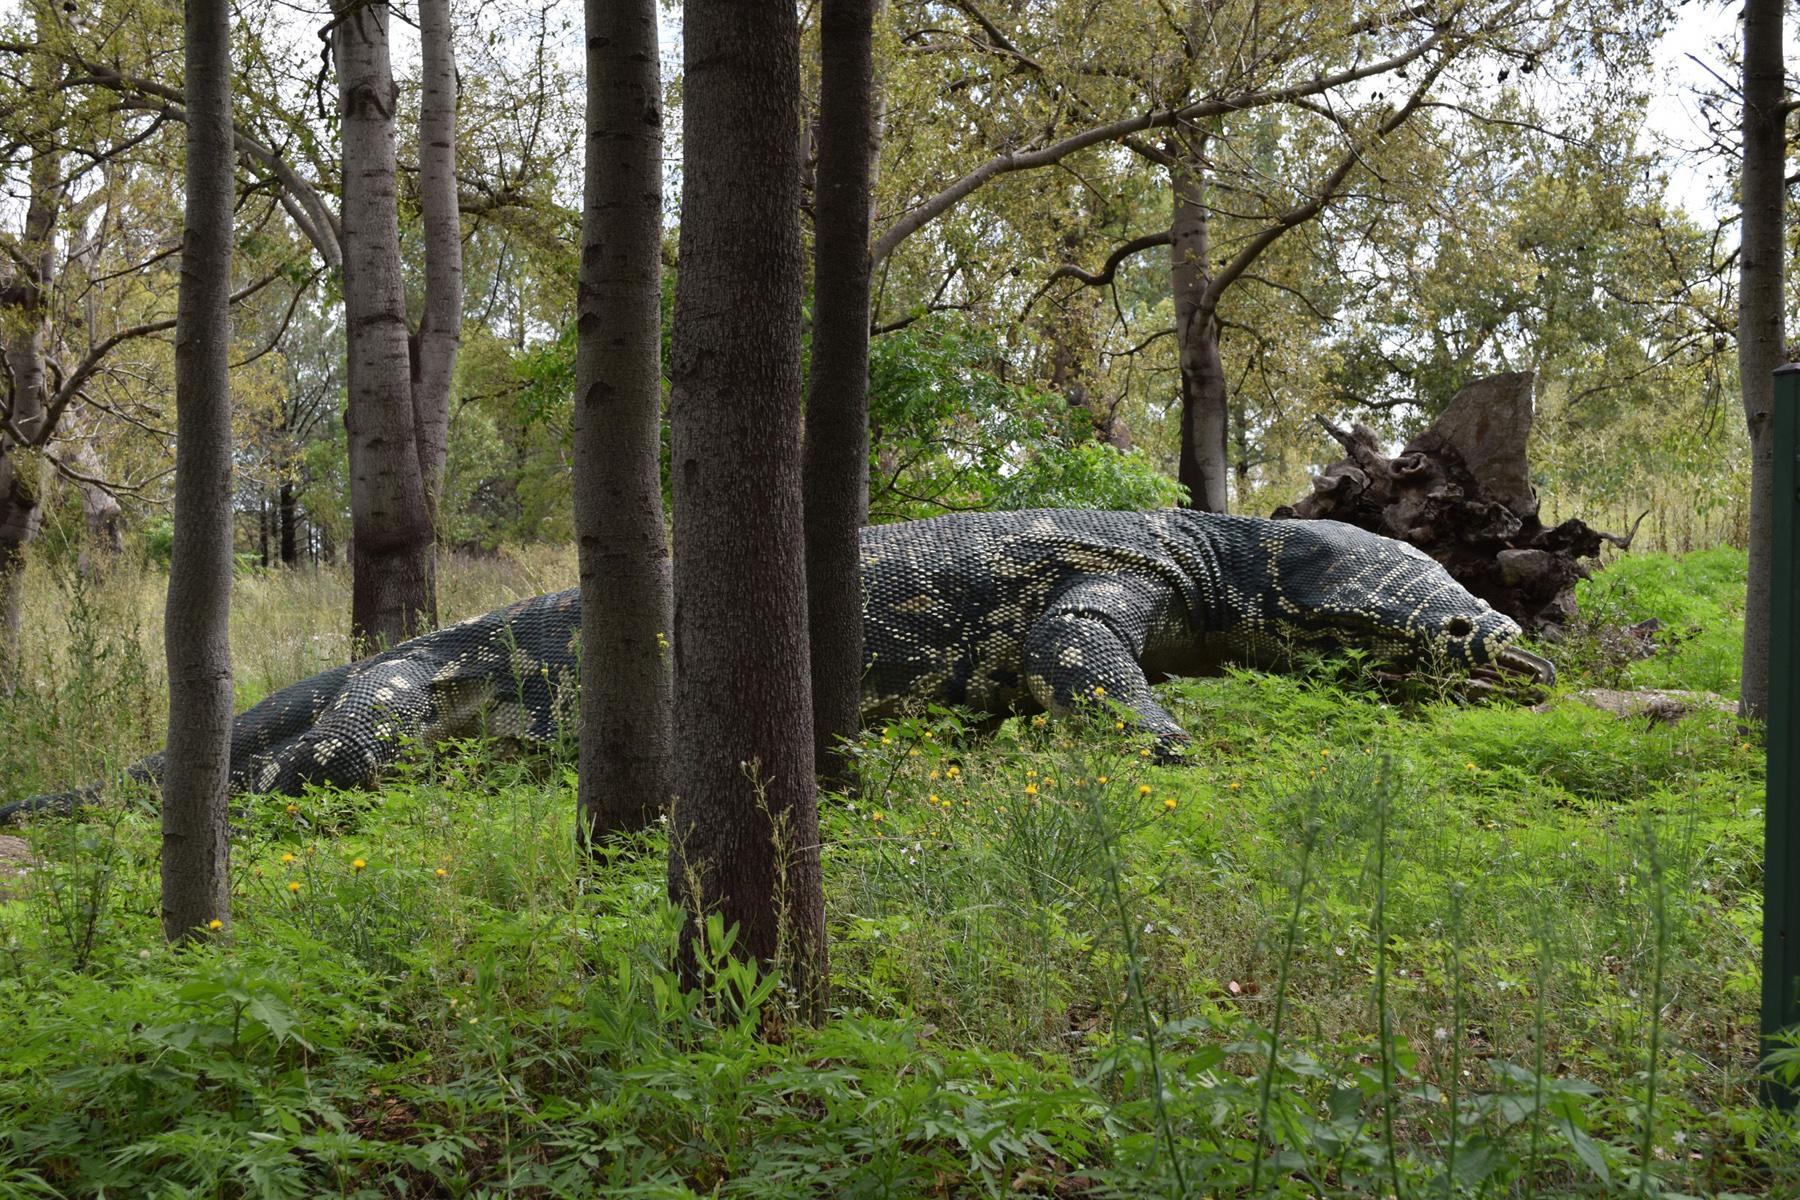 A large outdoor dinosaur sculpture